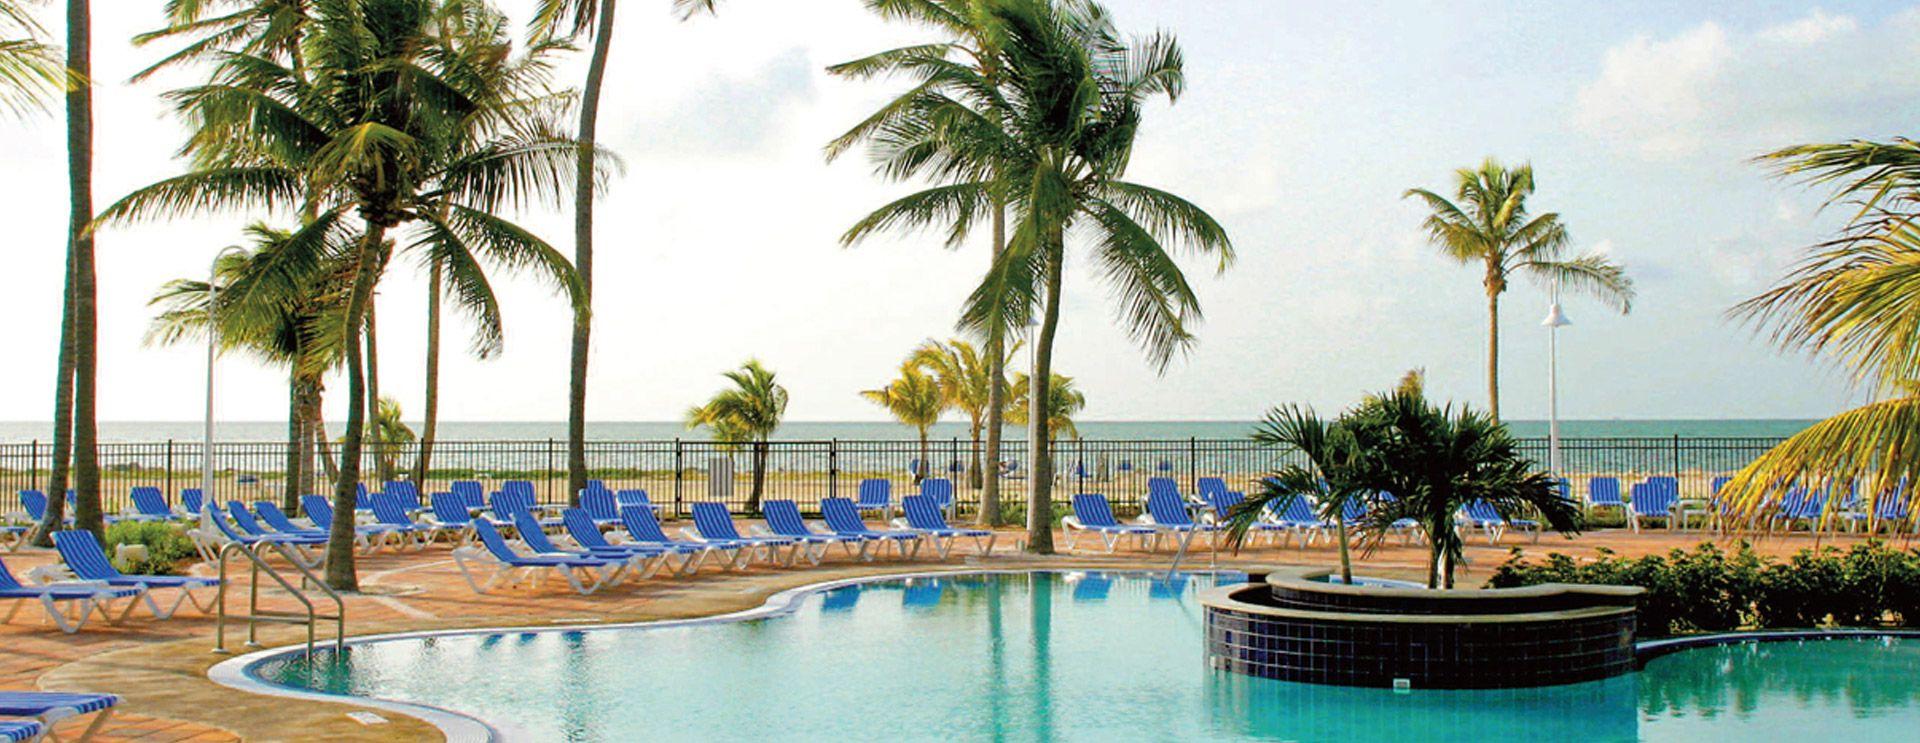 Best Kitchen Gallery: Guy Harvey Outpost Islander Hotel In Florida Keys Islamorada of Florida Keys Hotels And Resorts  on rachelxblog.com